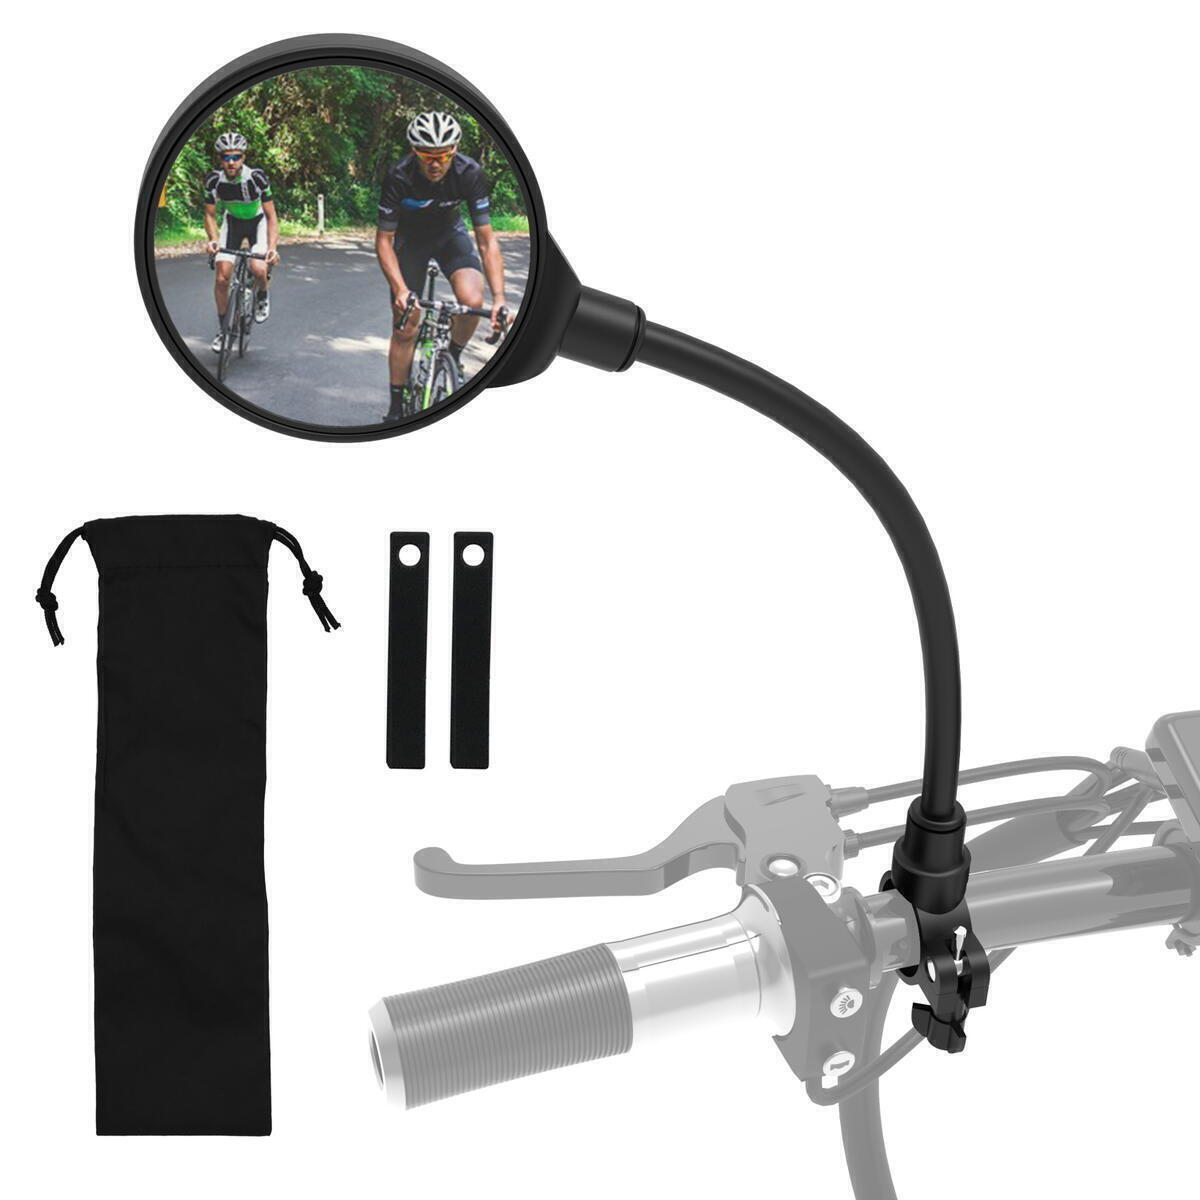 ROYOR Wide Angle Bike Mirror, 360° Adjustable Rotatable Bicycle Mirror